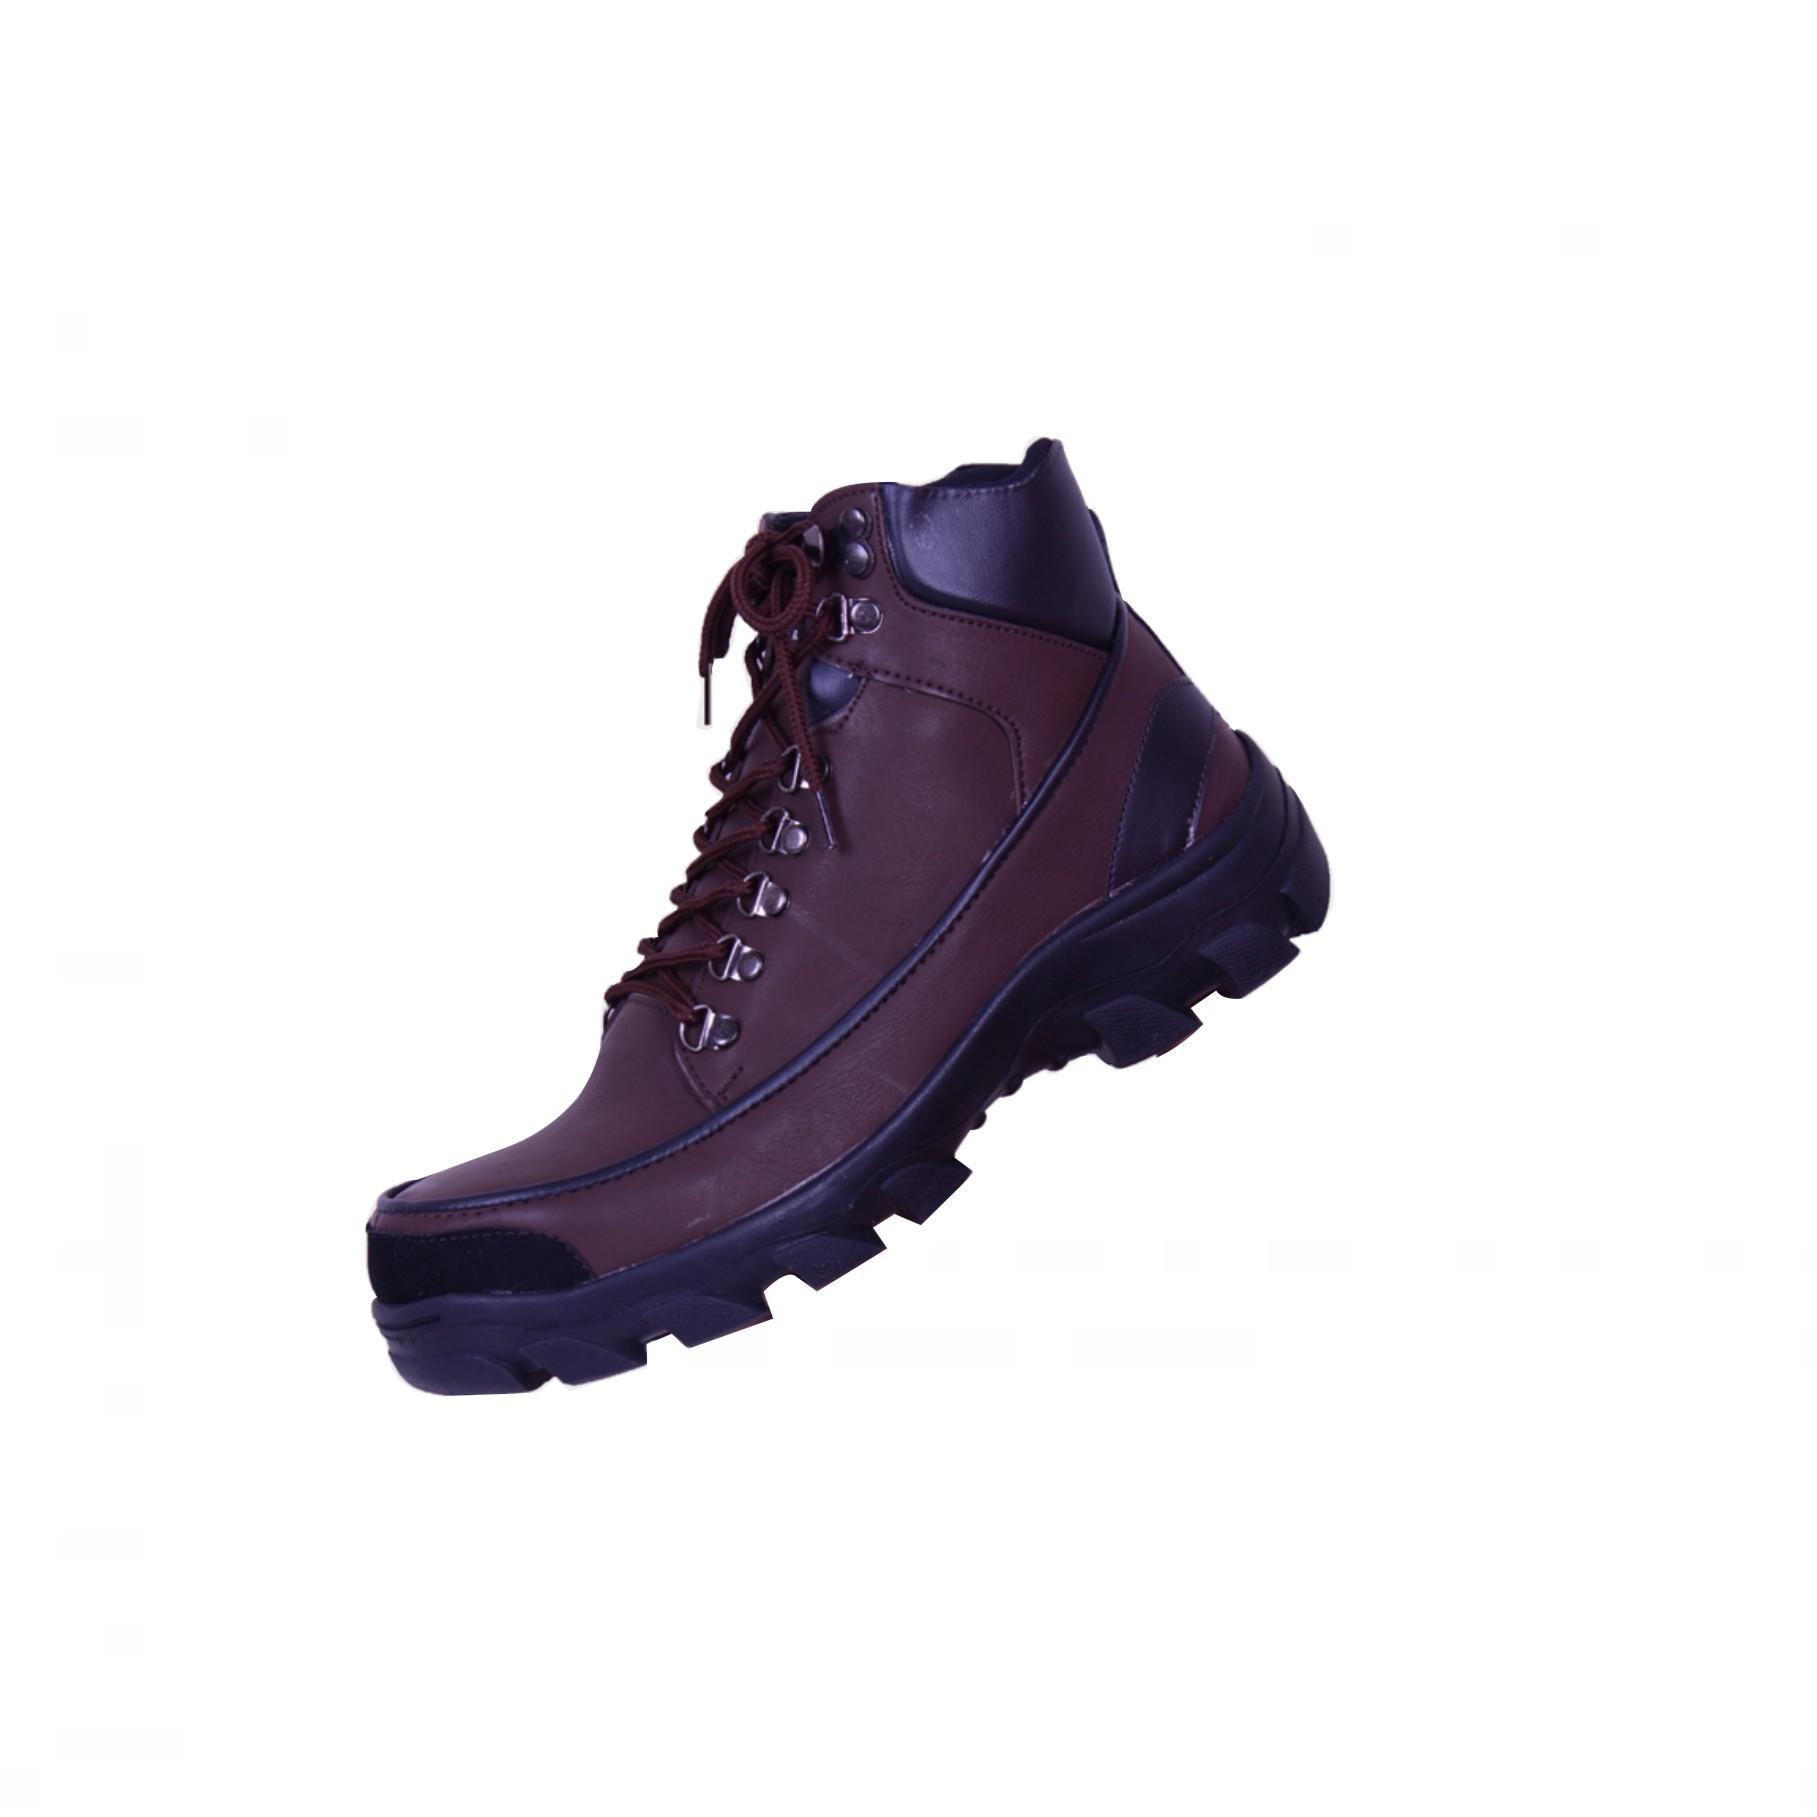 PROMO Sepatu Outdoor Zimzam Viper Pria Safety